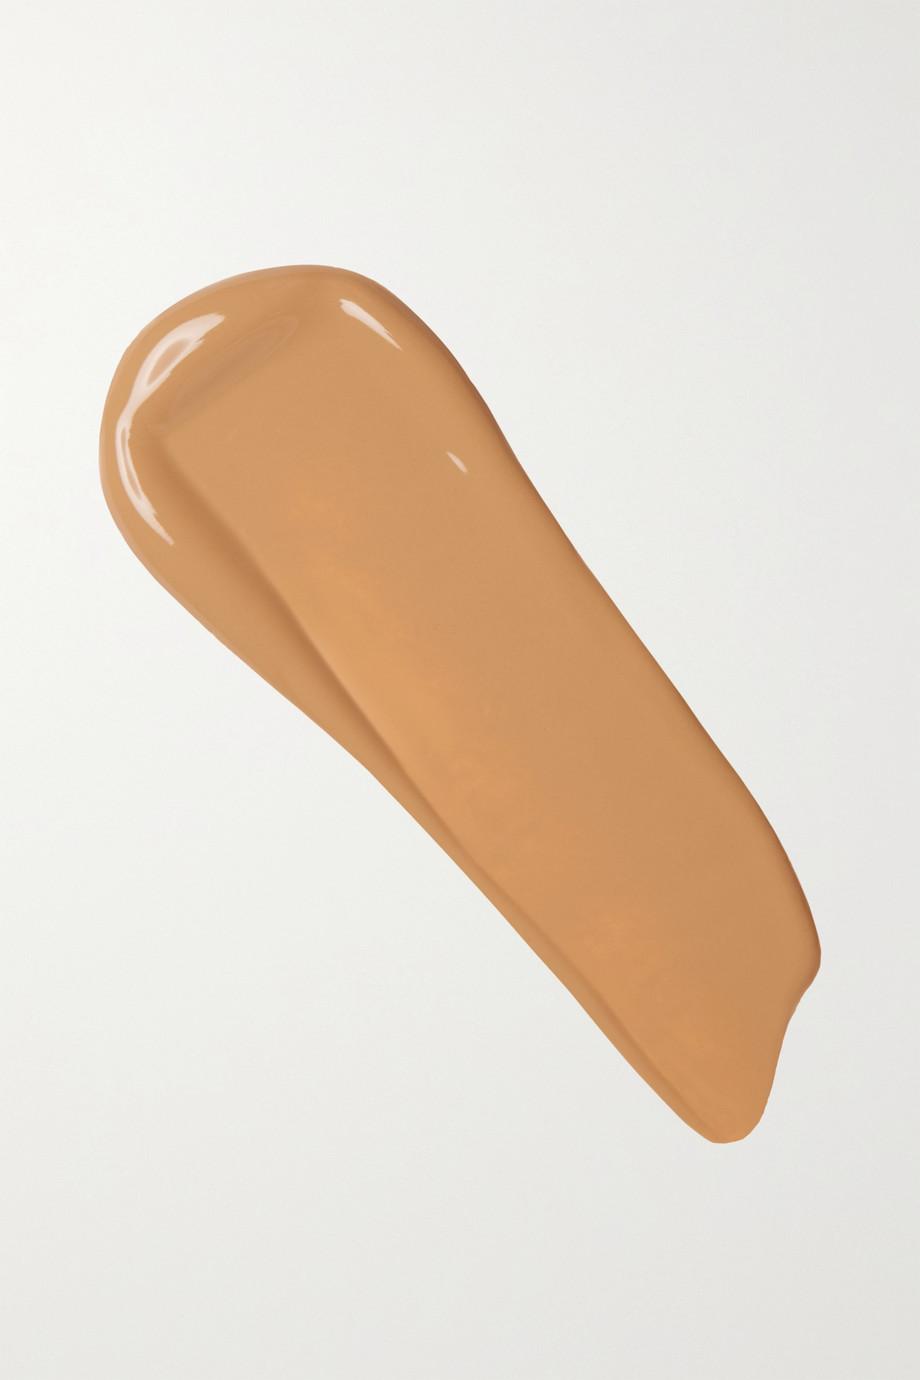 Surratt Beauty Dew Drop Foundation – 10, 19 ml – Foundation